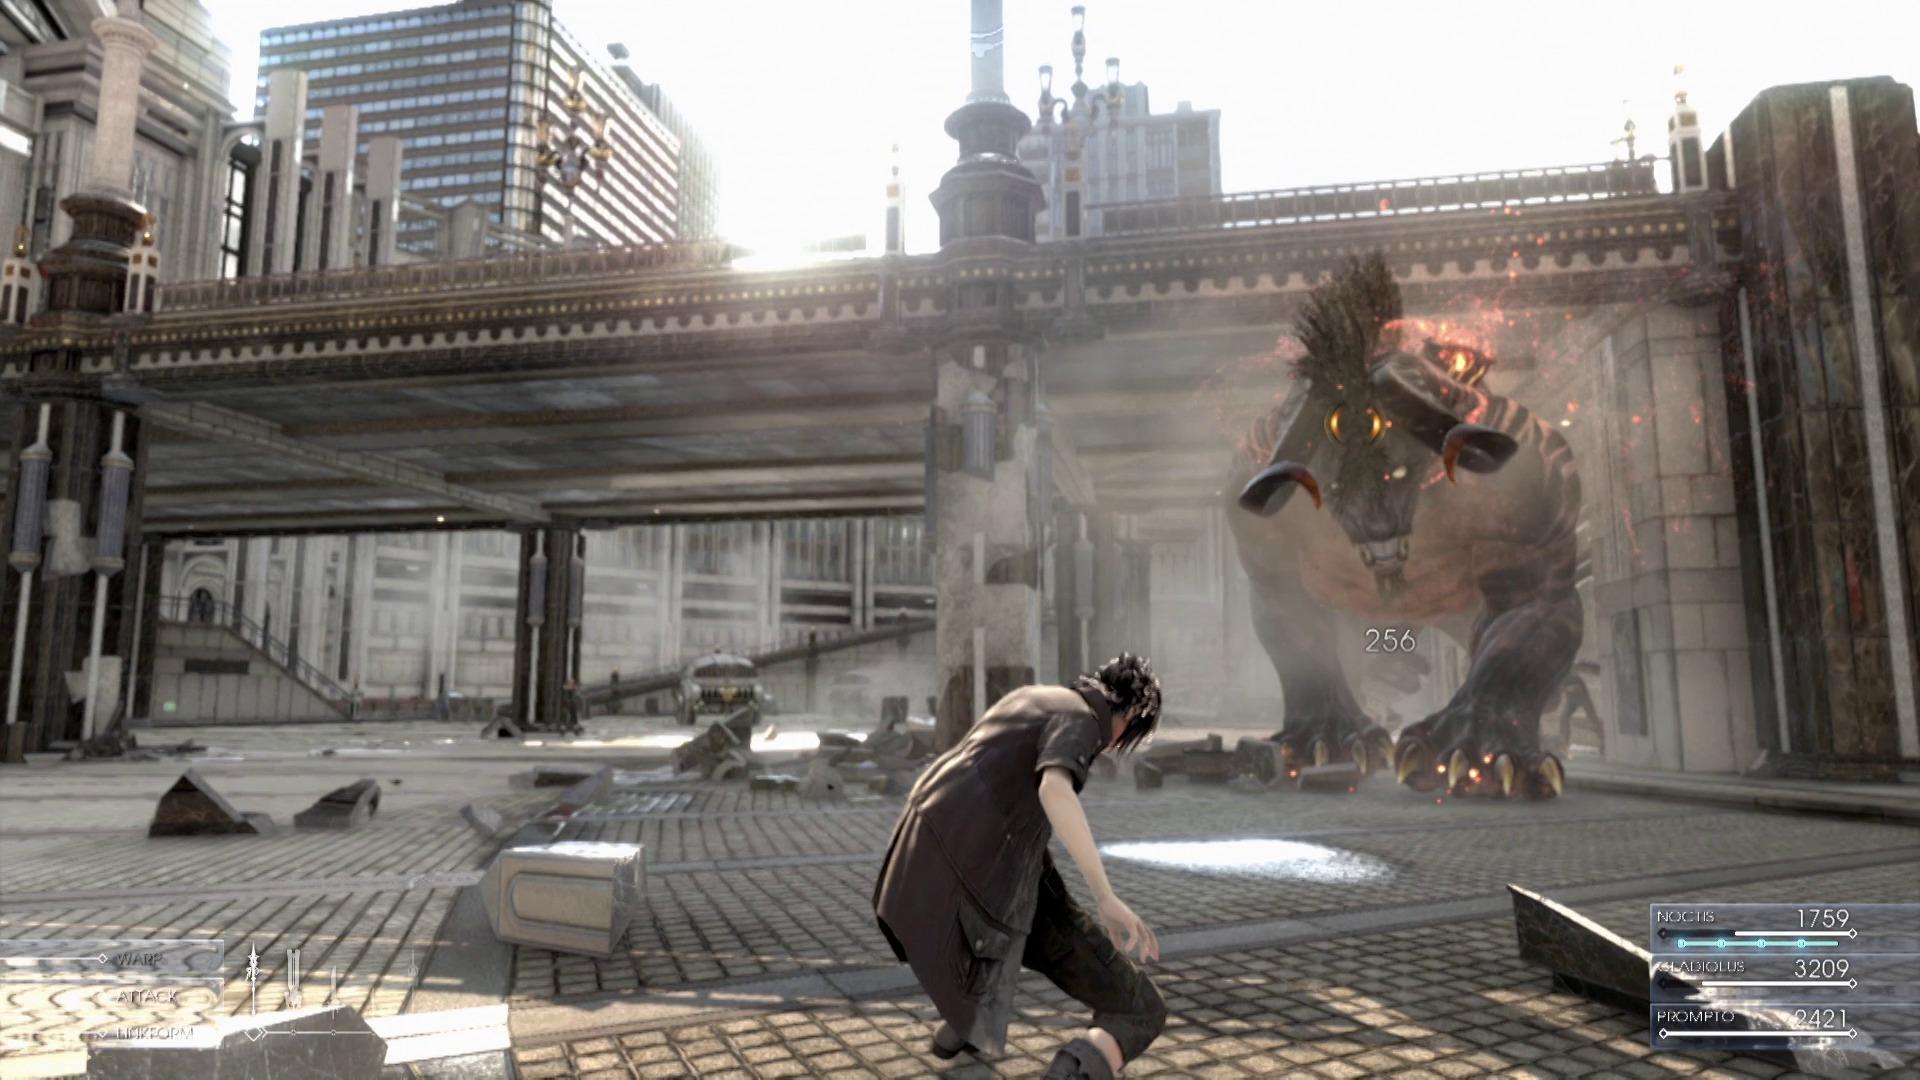 Will 'Final Fantasy XV' Make Western Gamers Love Japanese